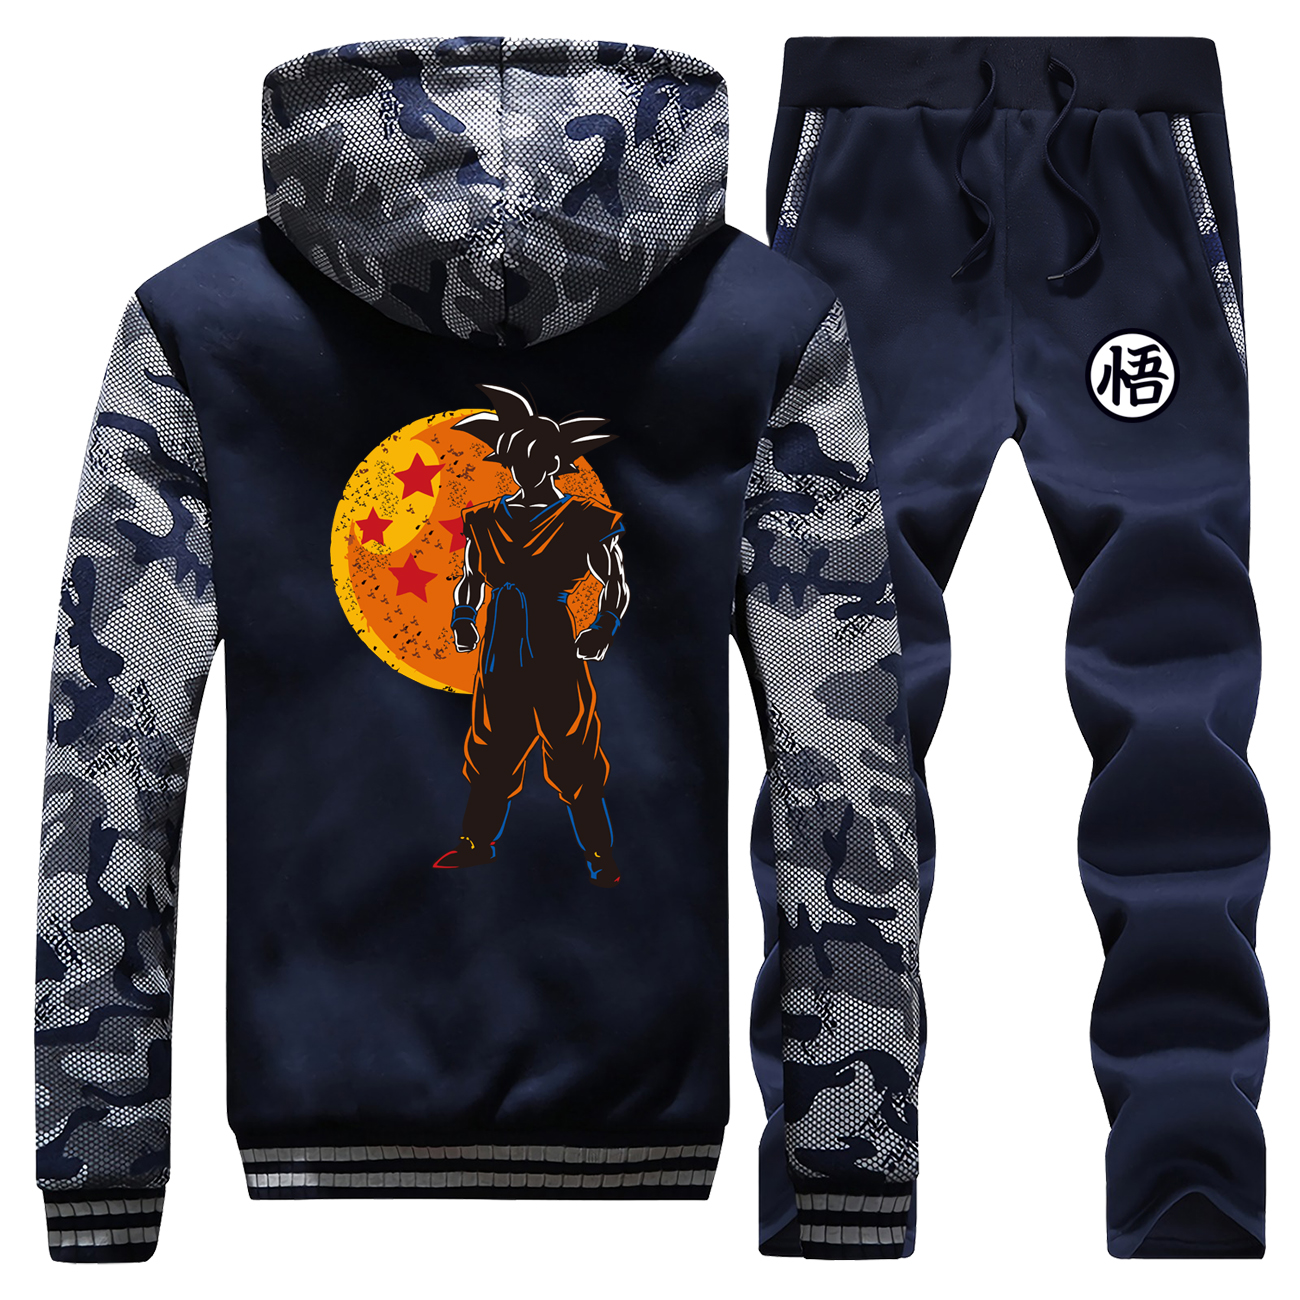 Streetwear Mens Suit Hooded Winter 2019 Dragon Ball Anime Camouflage Raglan Coat Thick Jackets Zipper Hoodie+Pants 2 Piece Set